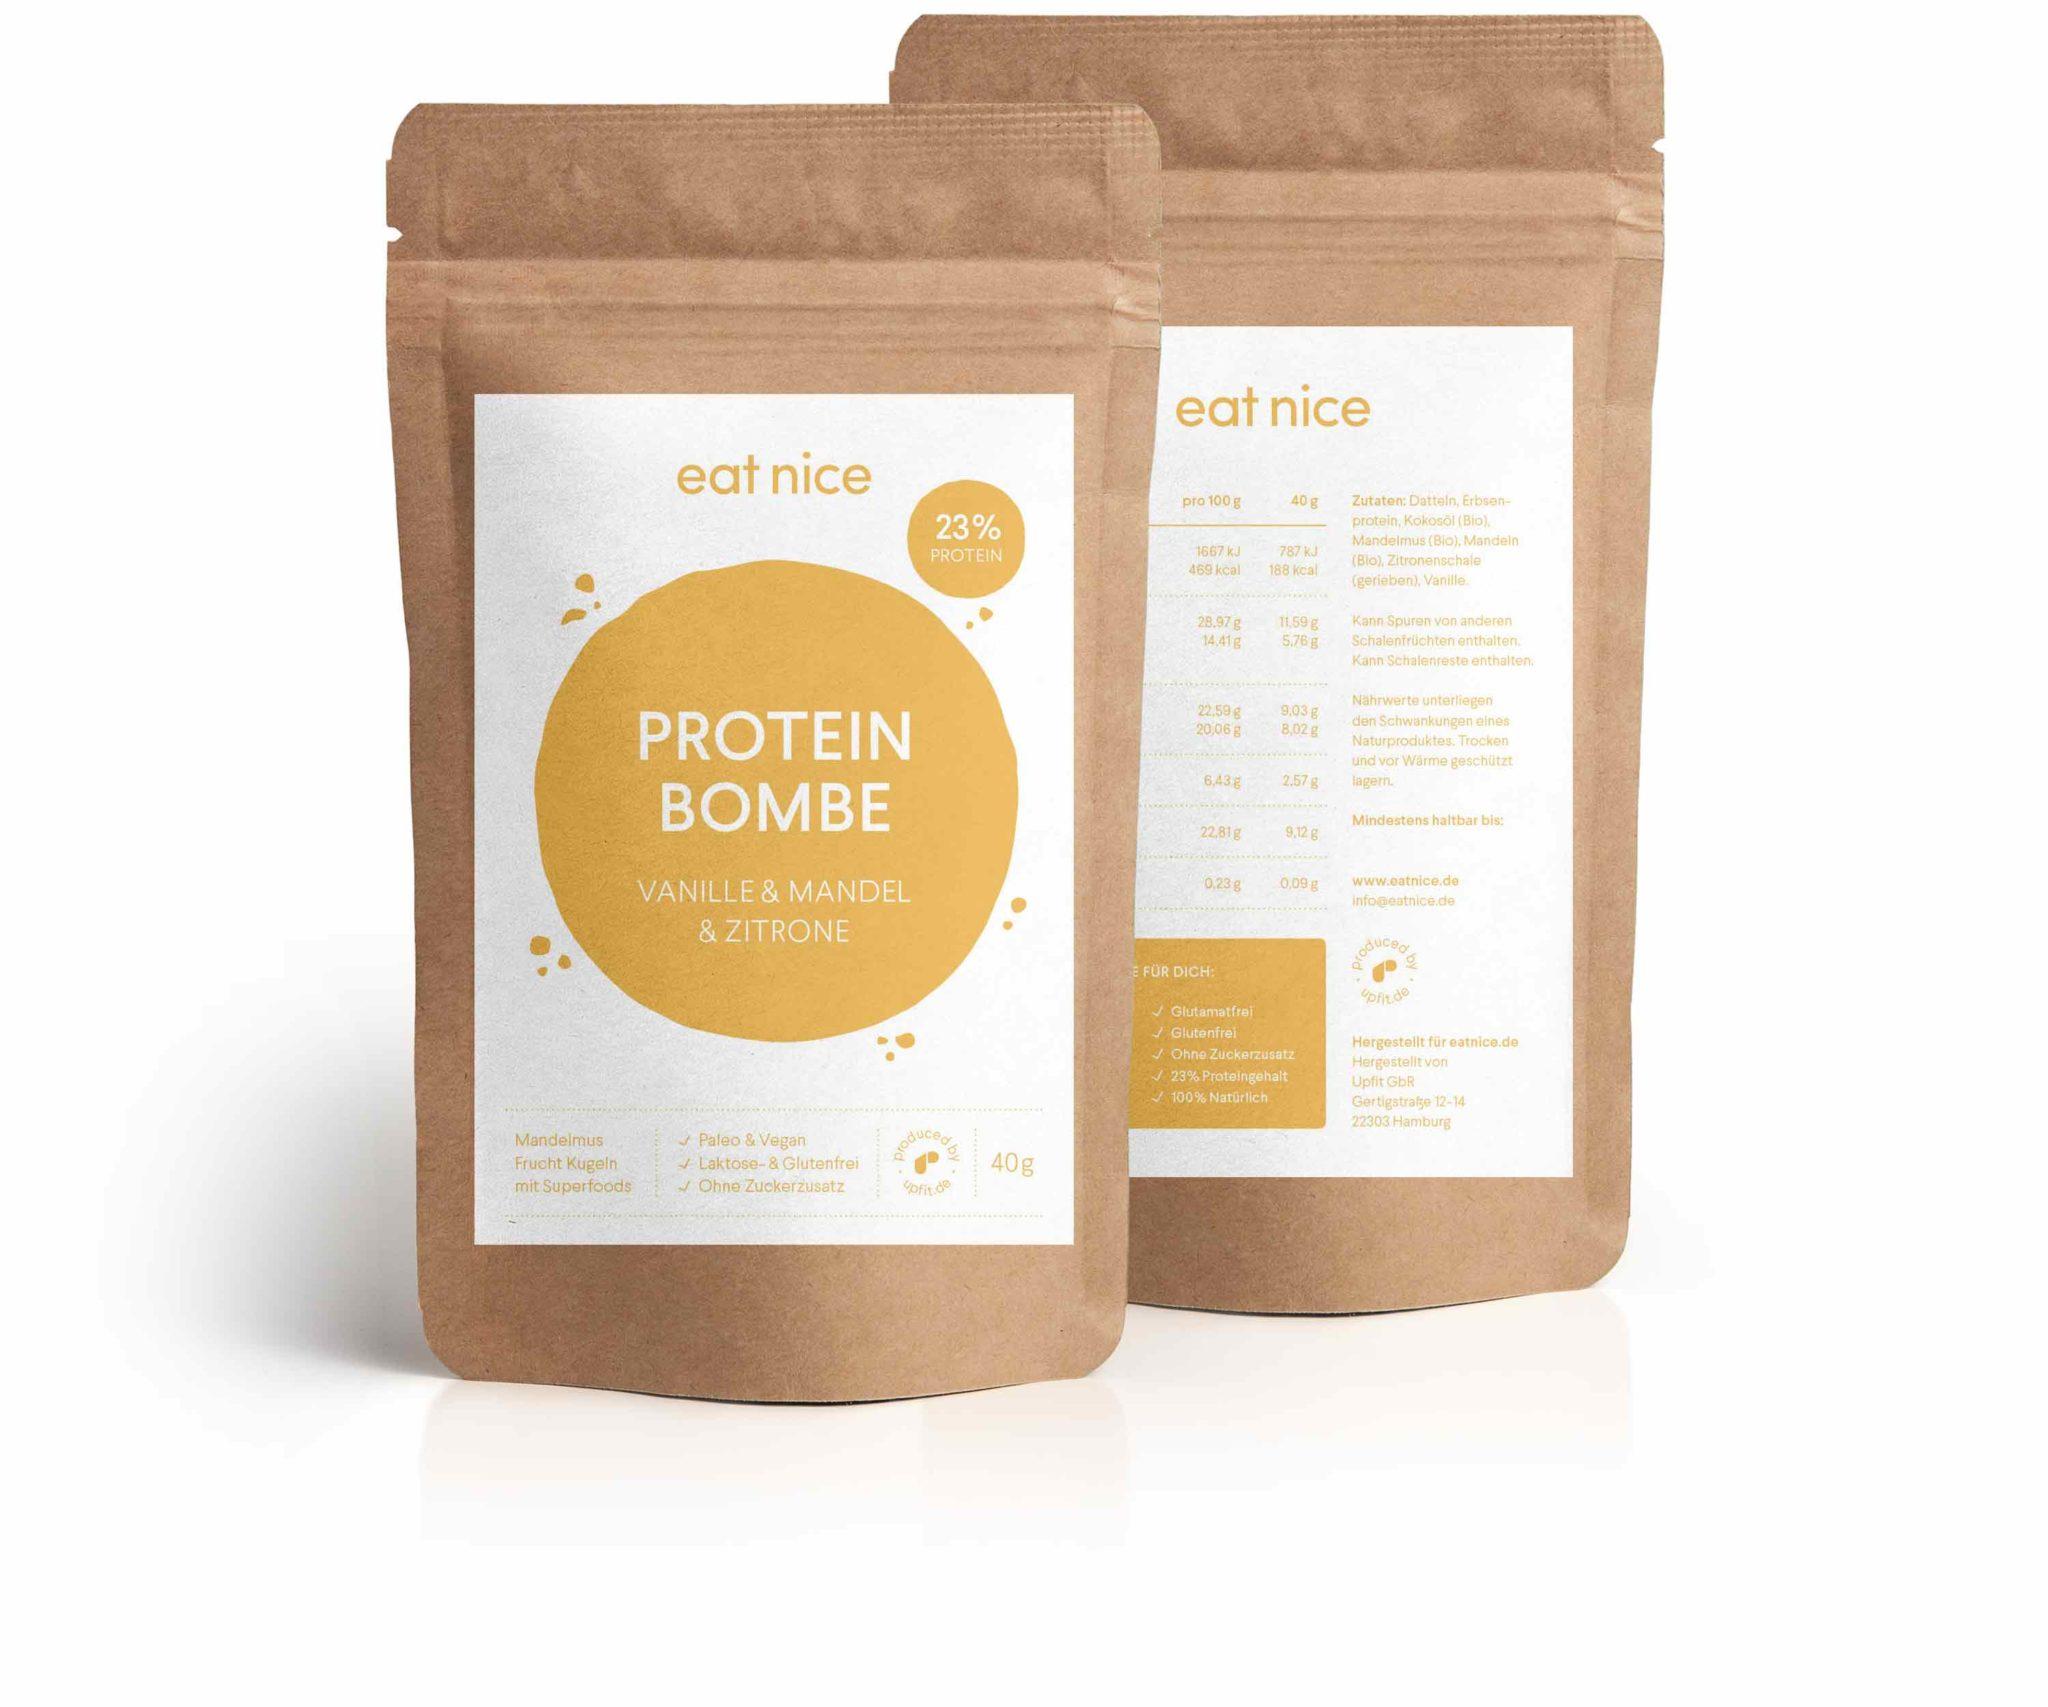 Eat Nice Proteinbombe Protein Eiweiss